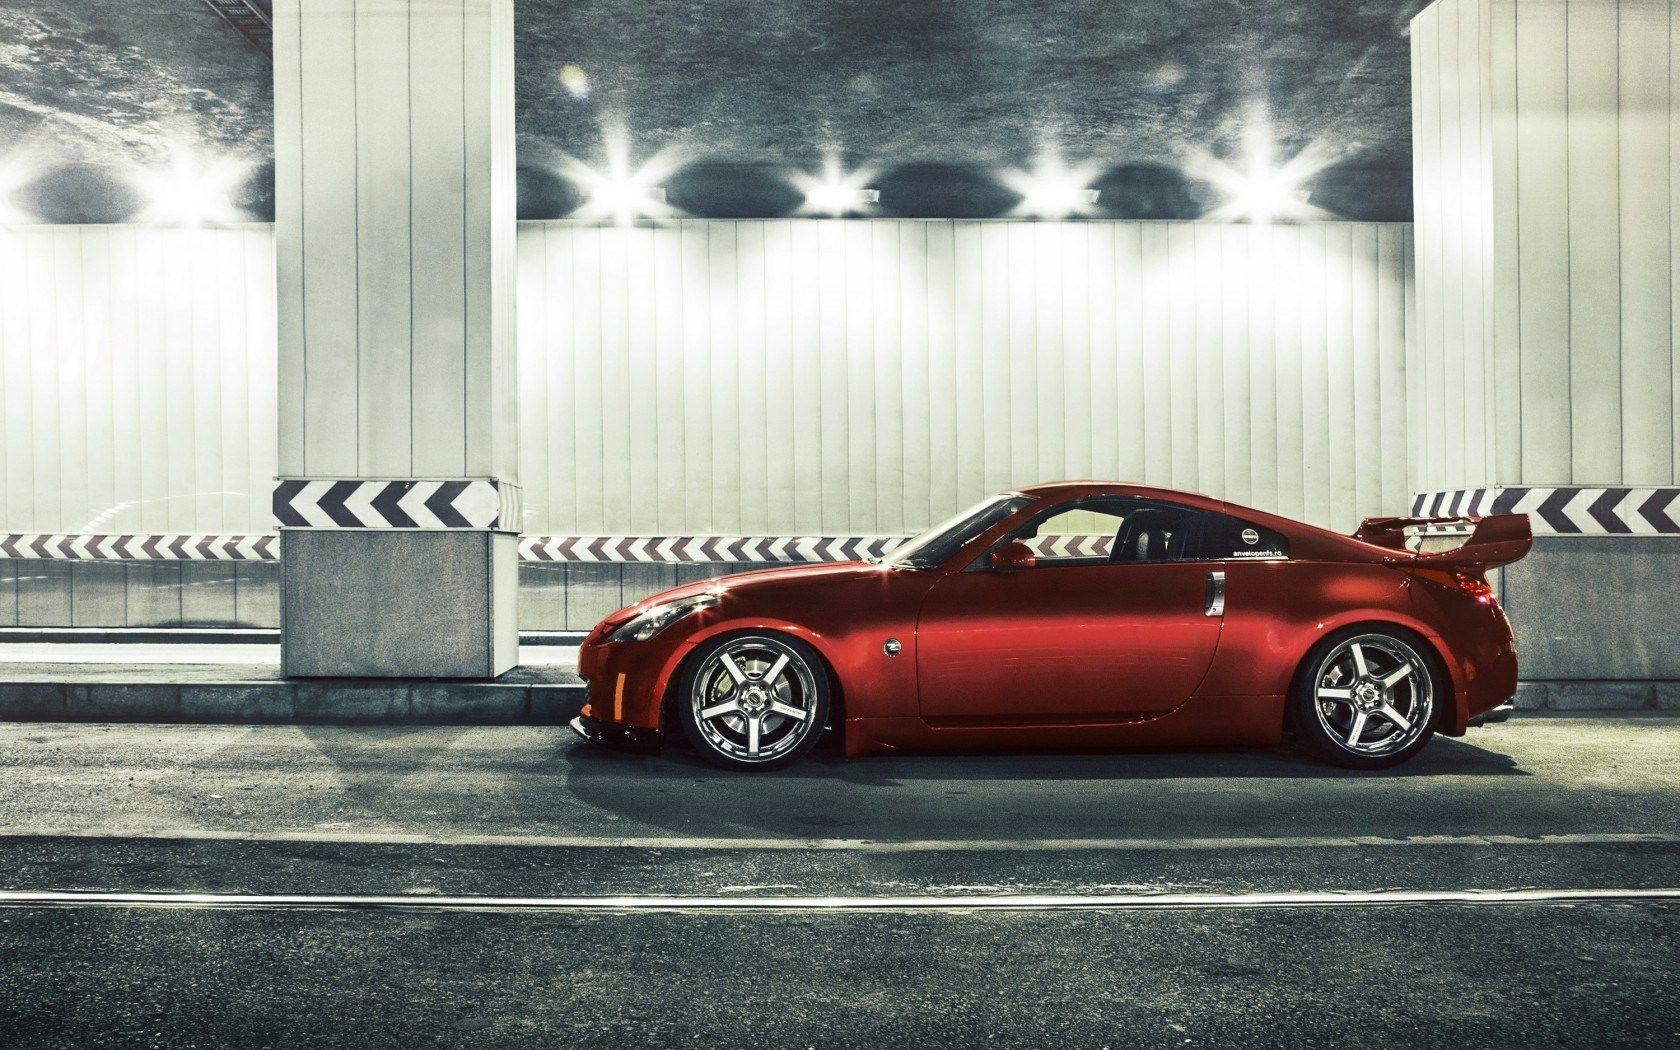 Beau Nissan 350z Tuning Car Street Hd Wallpaper